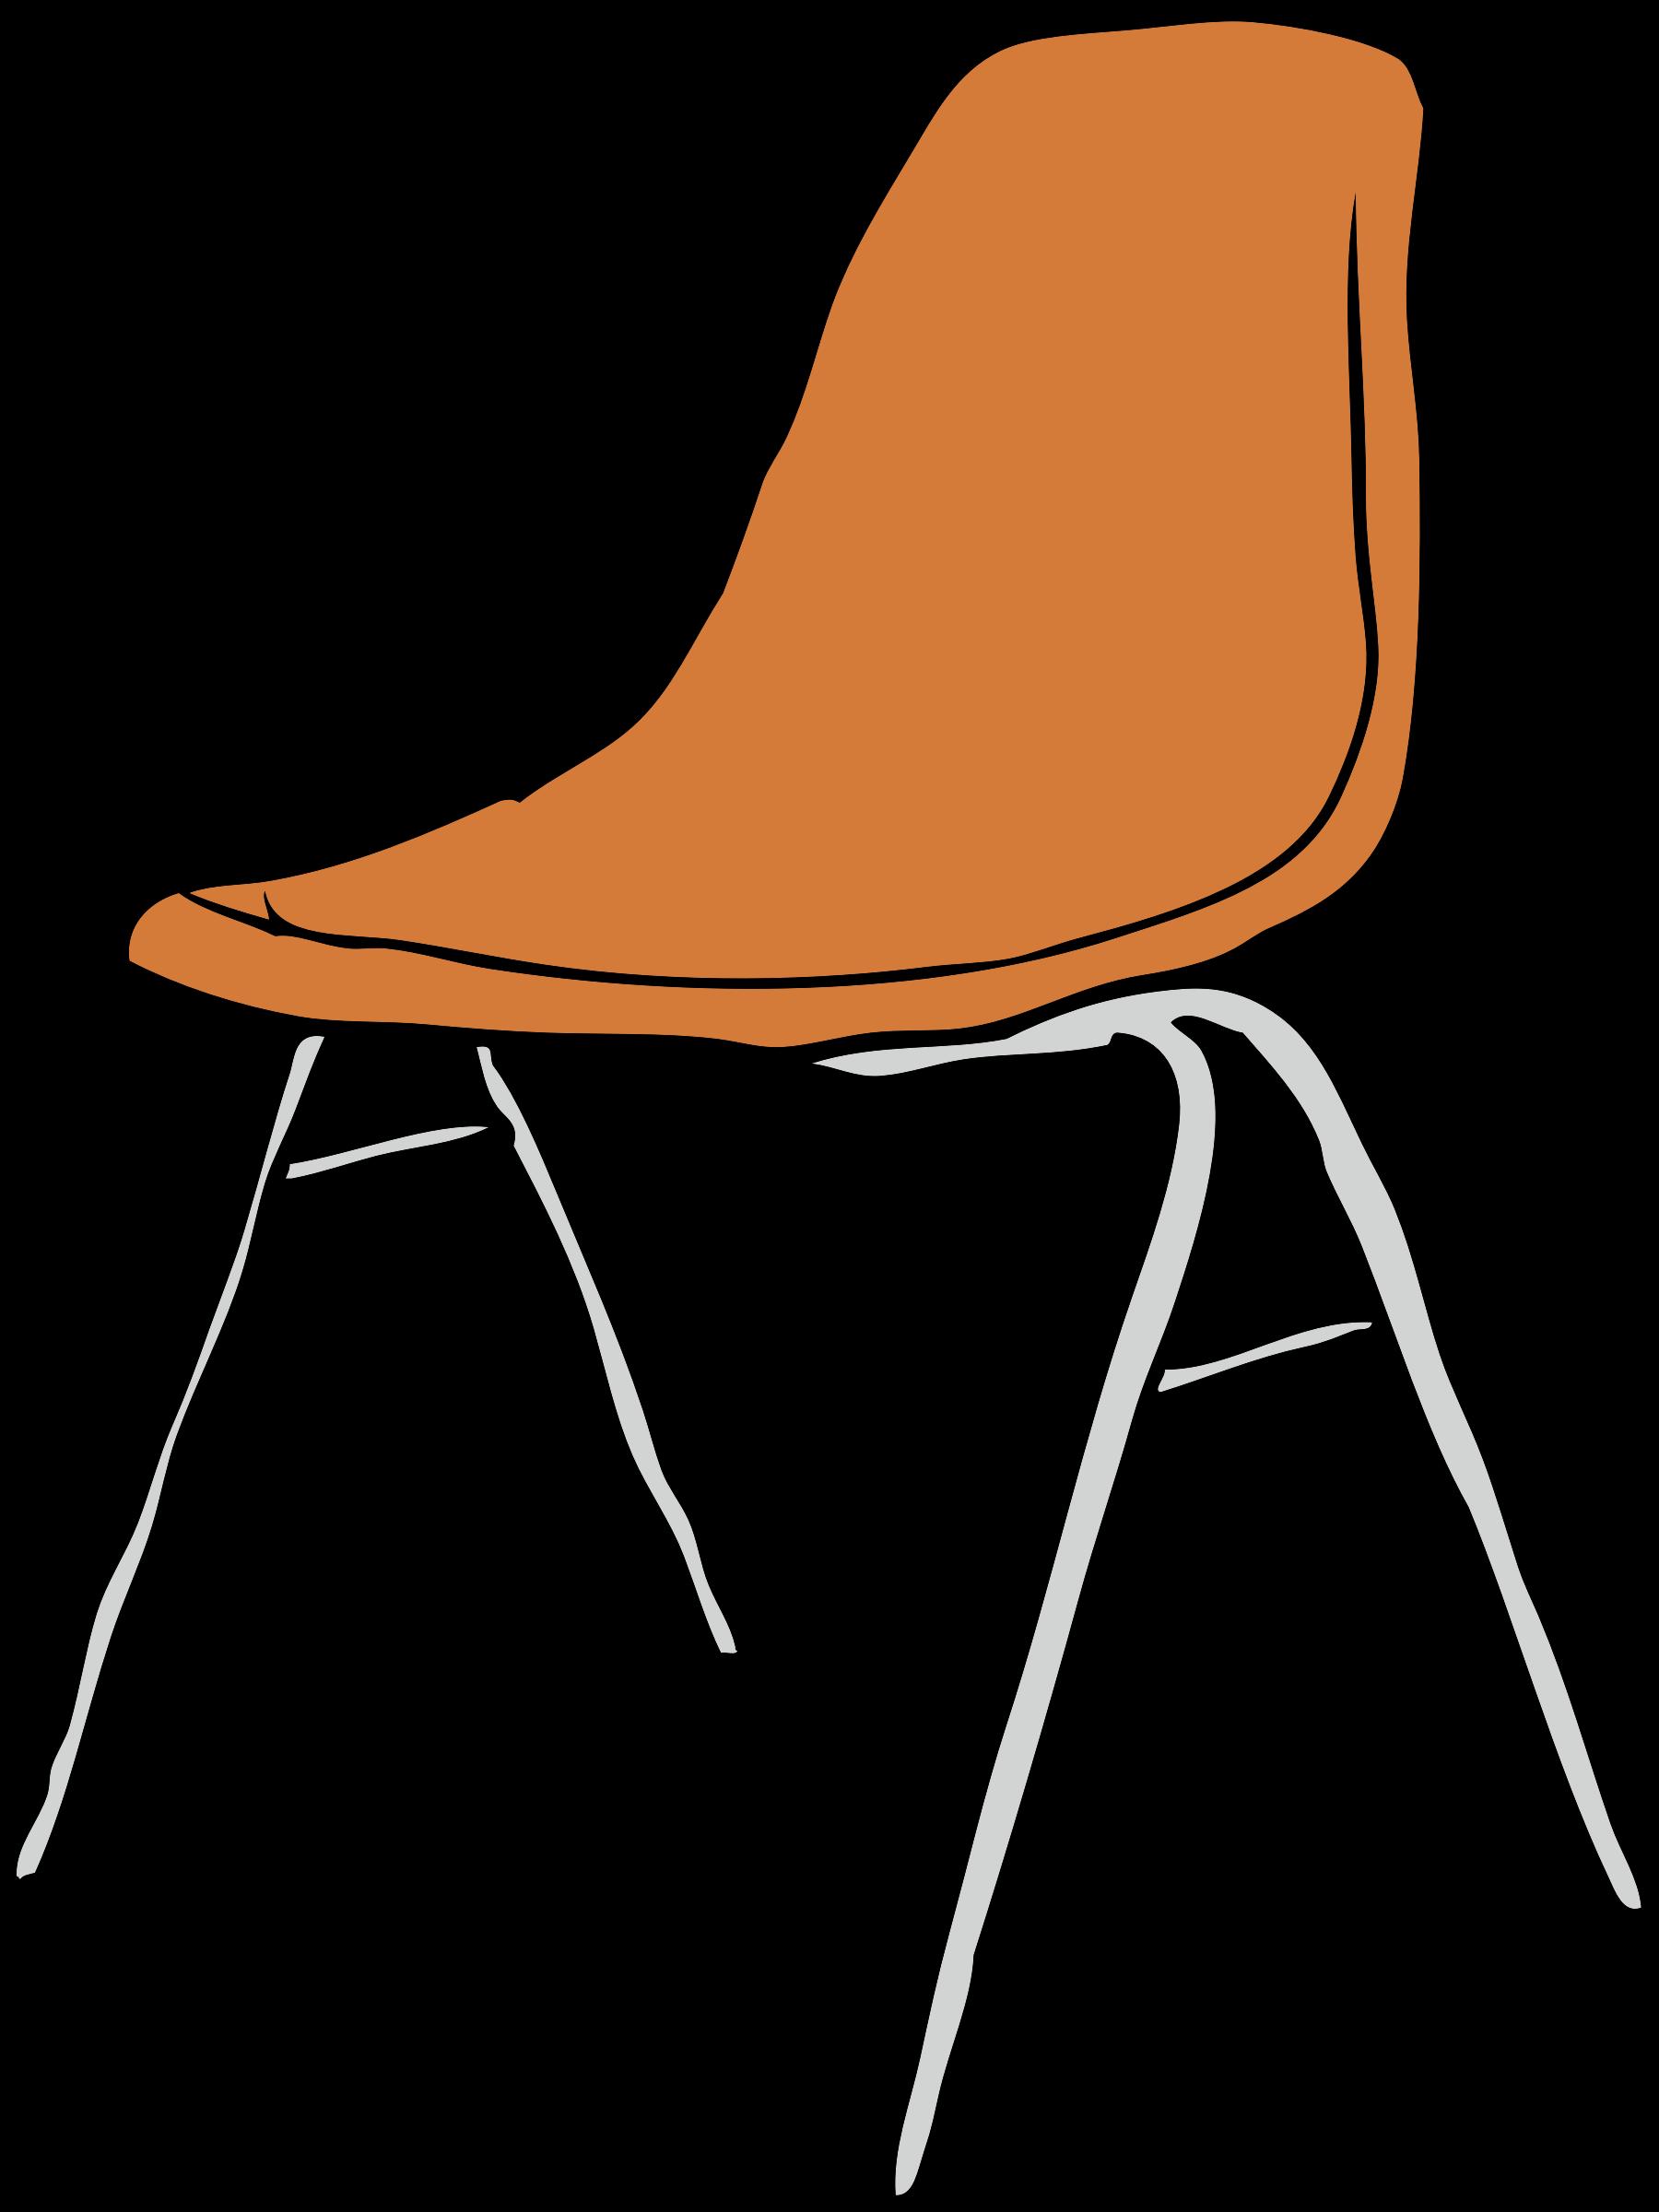 School chair clipart clip art free library Clipart - Modern Chair 3/4 Angle clip art free library